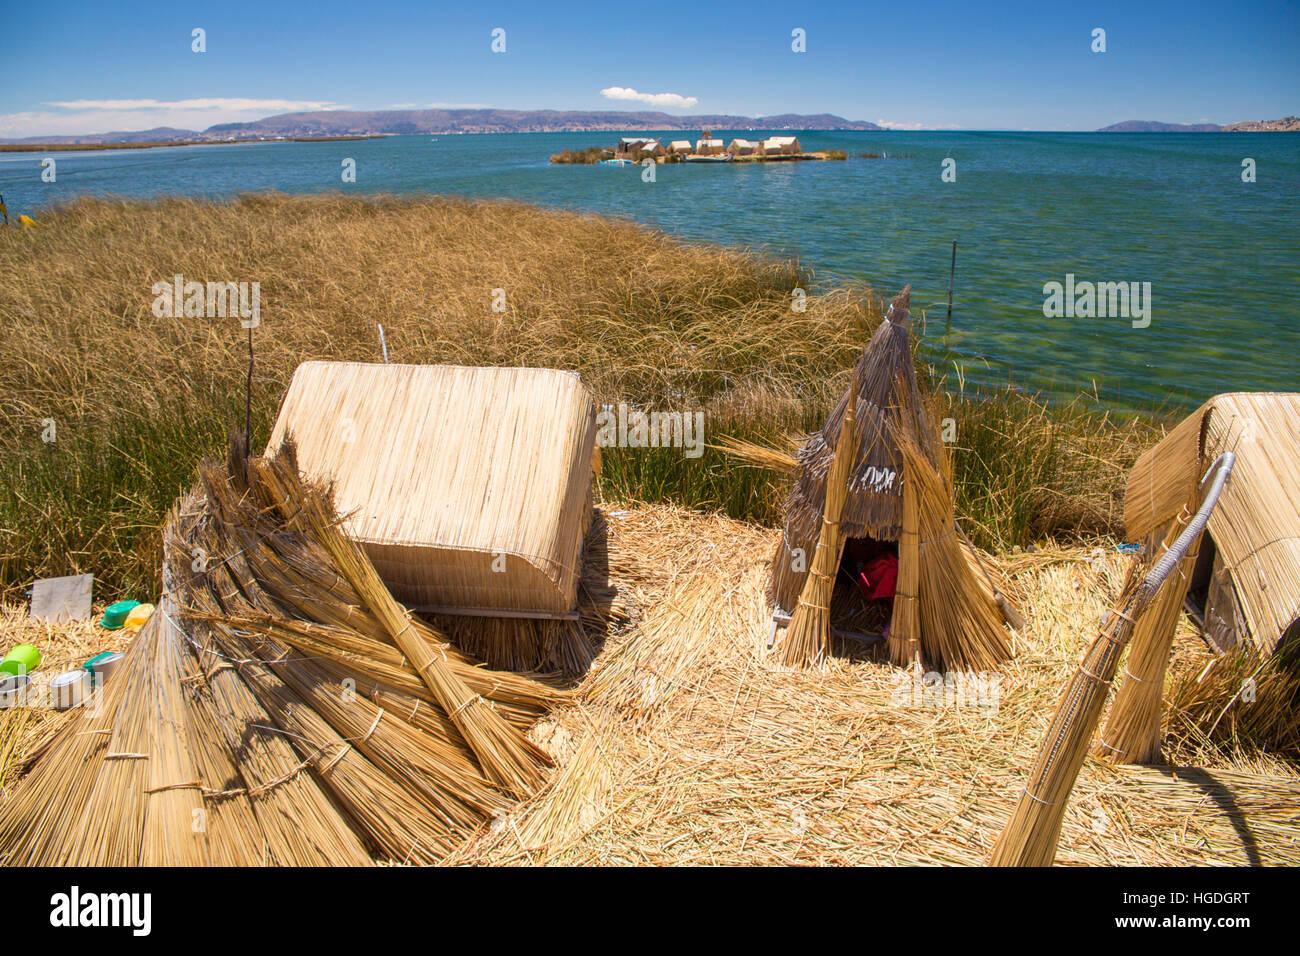 Uros, reed island, lake Titicaca, - Stock Image